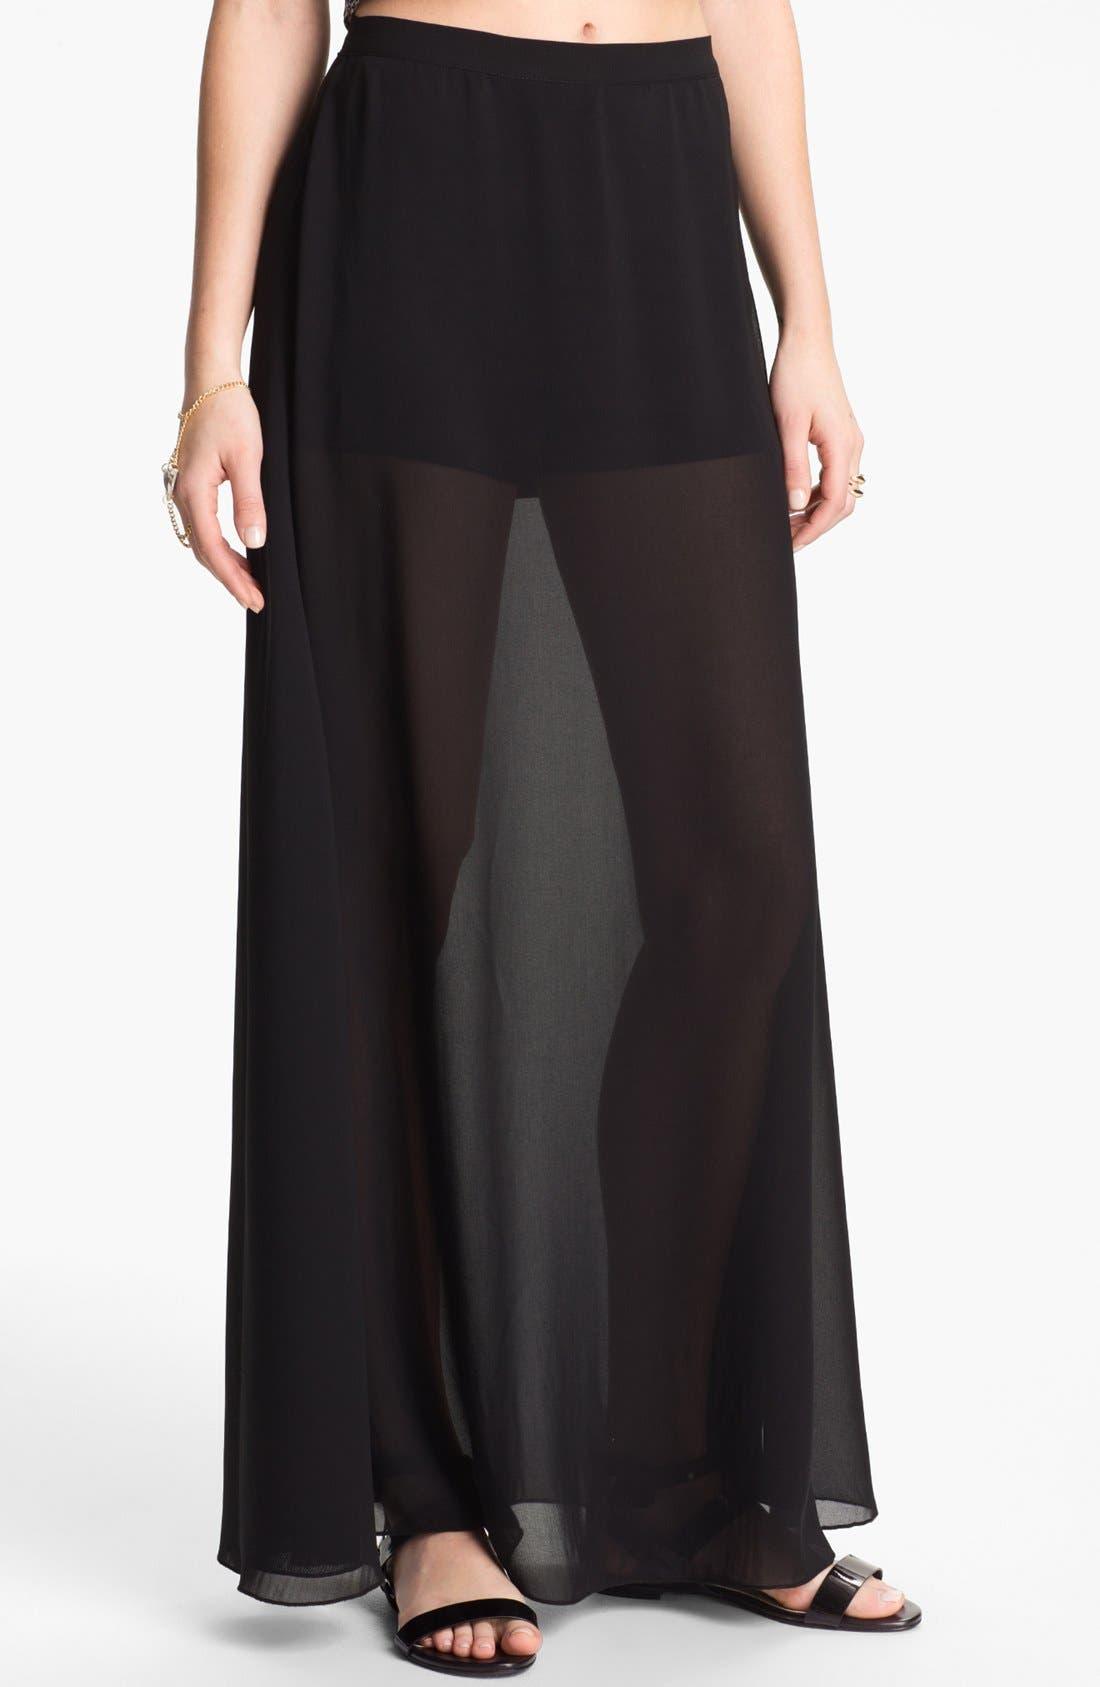 Alternate Image 1 Selected - Mimi Chica Sheer Chiffon Maxi Skirt (Juniors)